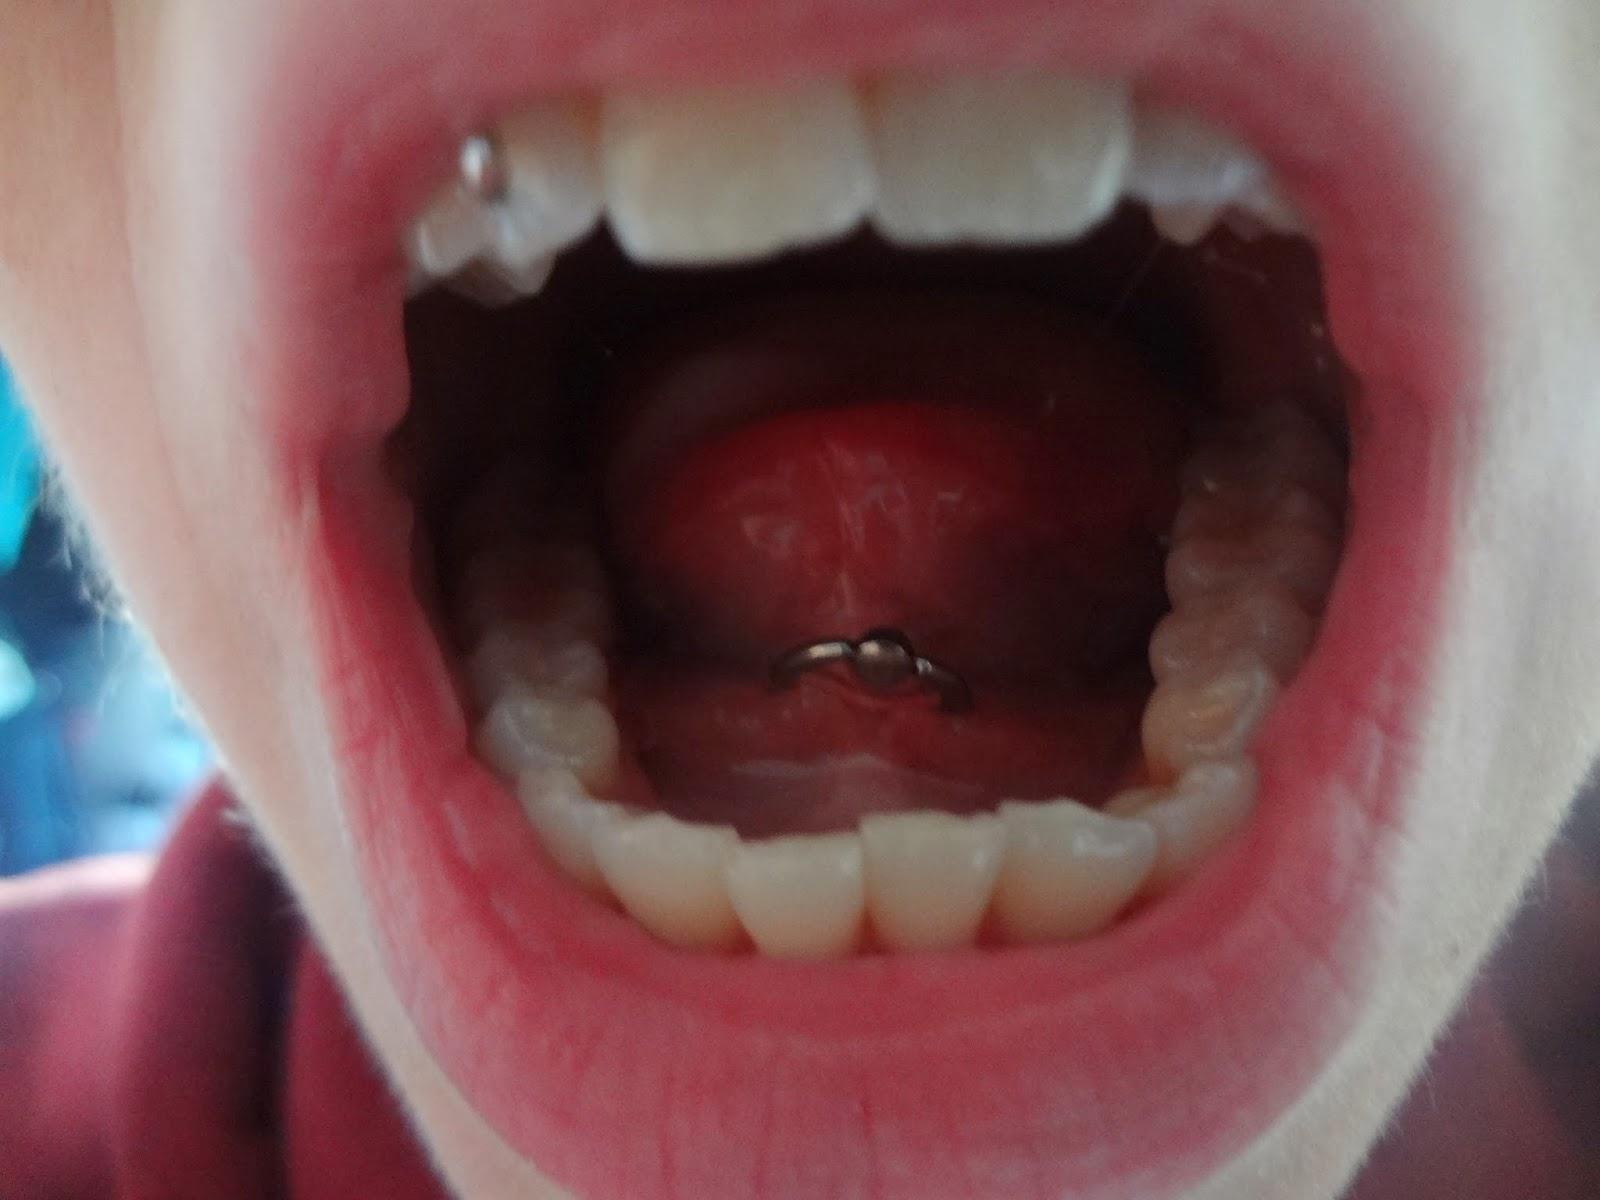 Muskelkater Zunge